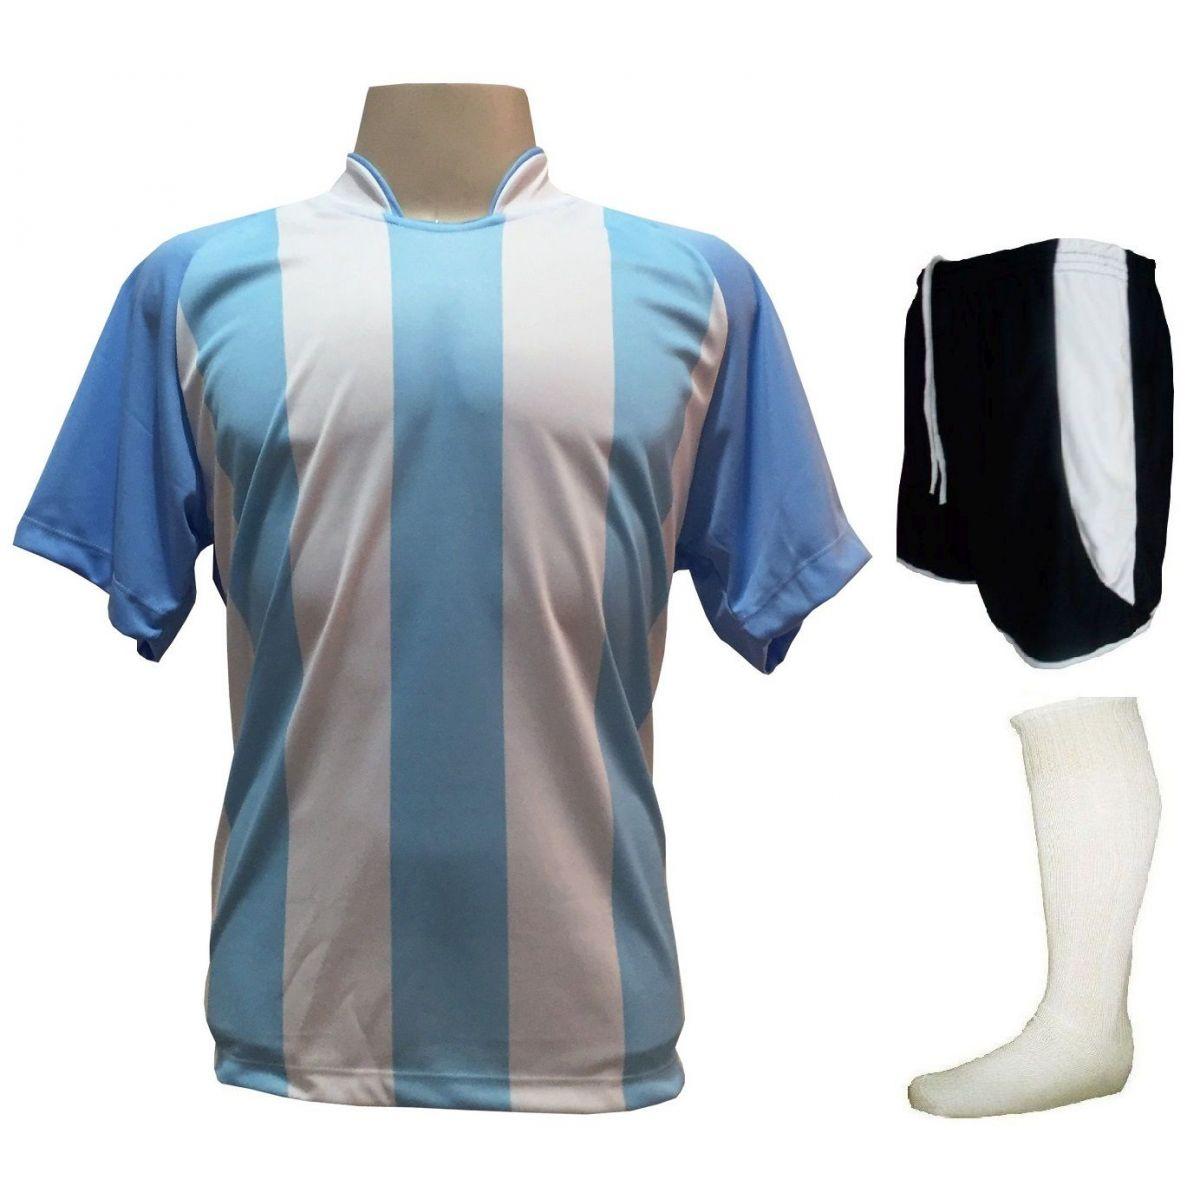 Fardamento Completo modelo Milan 20+2 (20 camisas Celeste/Branco + 20 calções modelo Copa Preto/Branco + 20 pares de meiões Branco + 2 conjuntos de goleiro) + Brindes